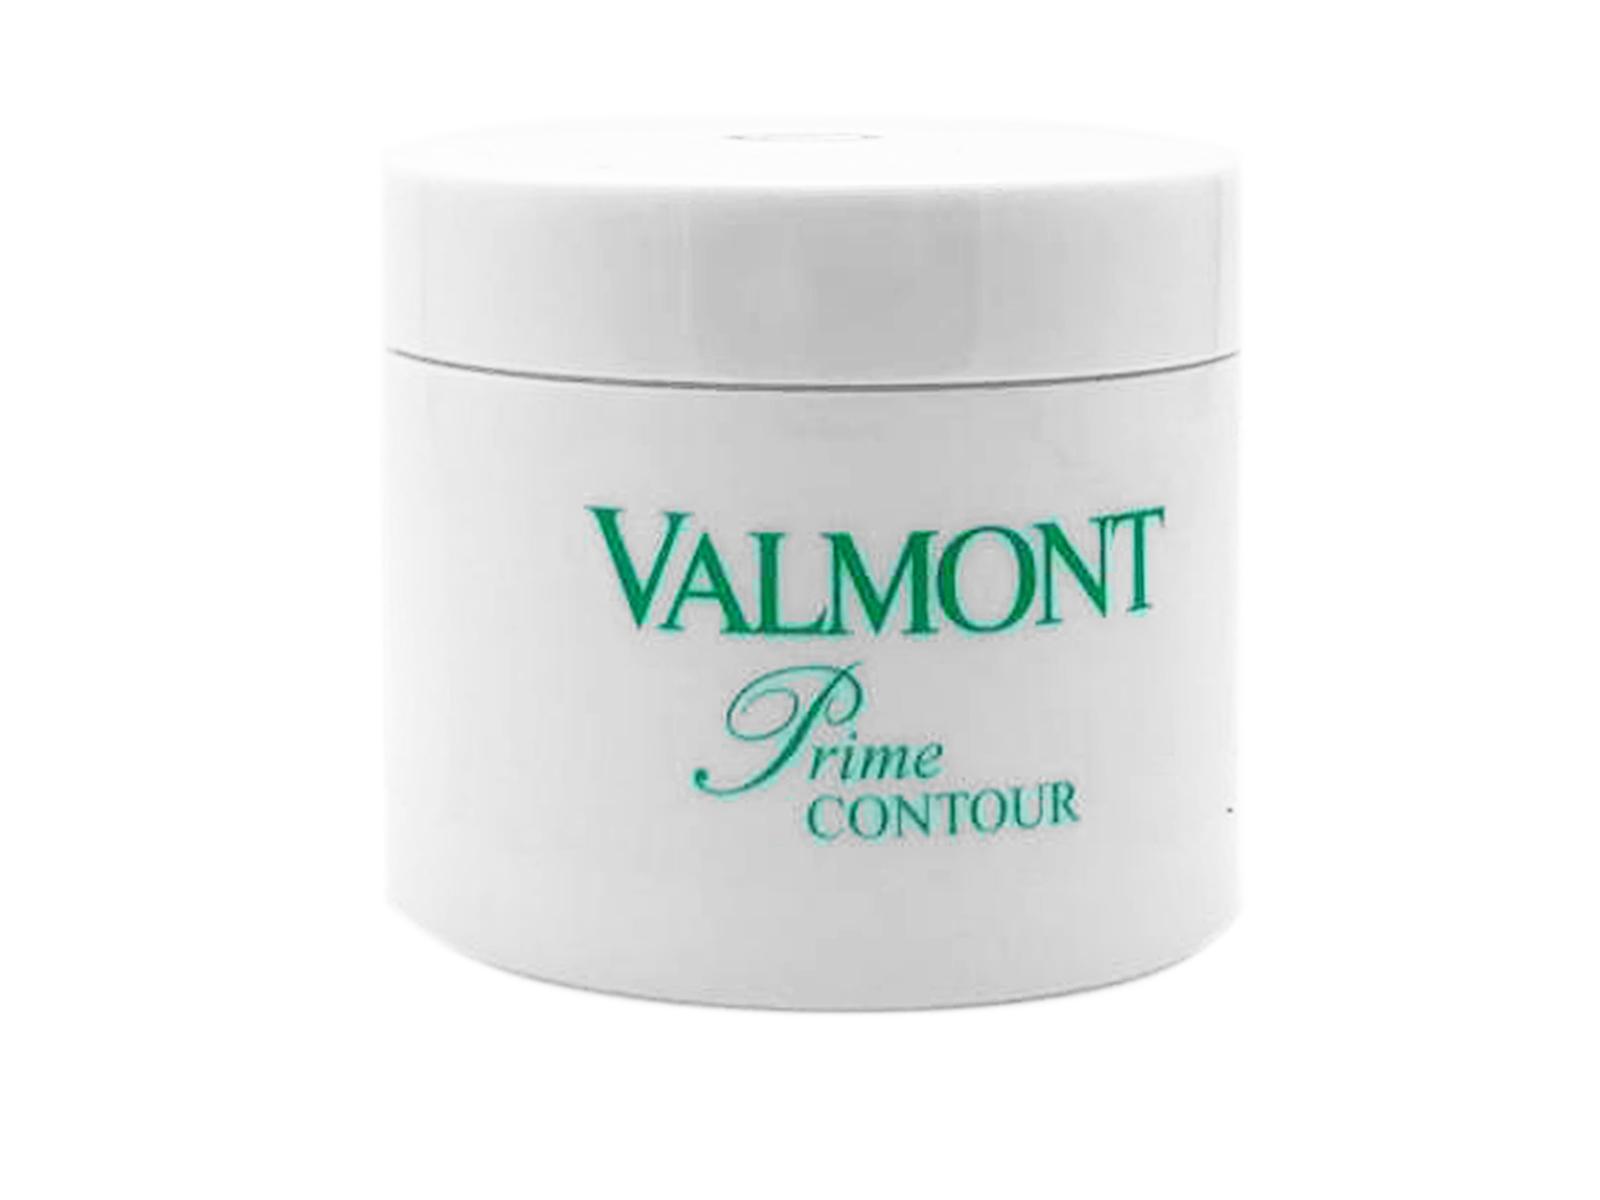 Valmont Prime Contour 100ml